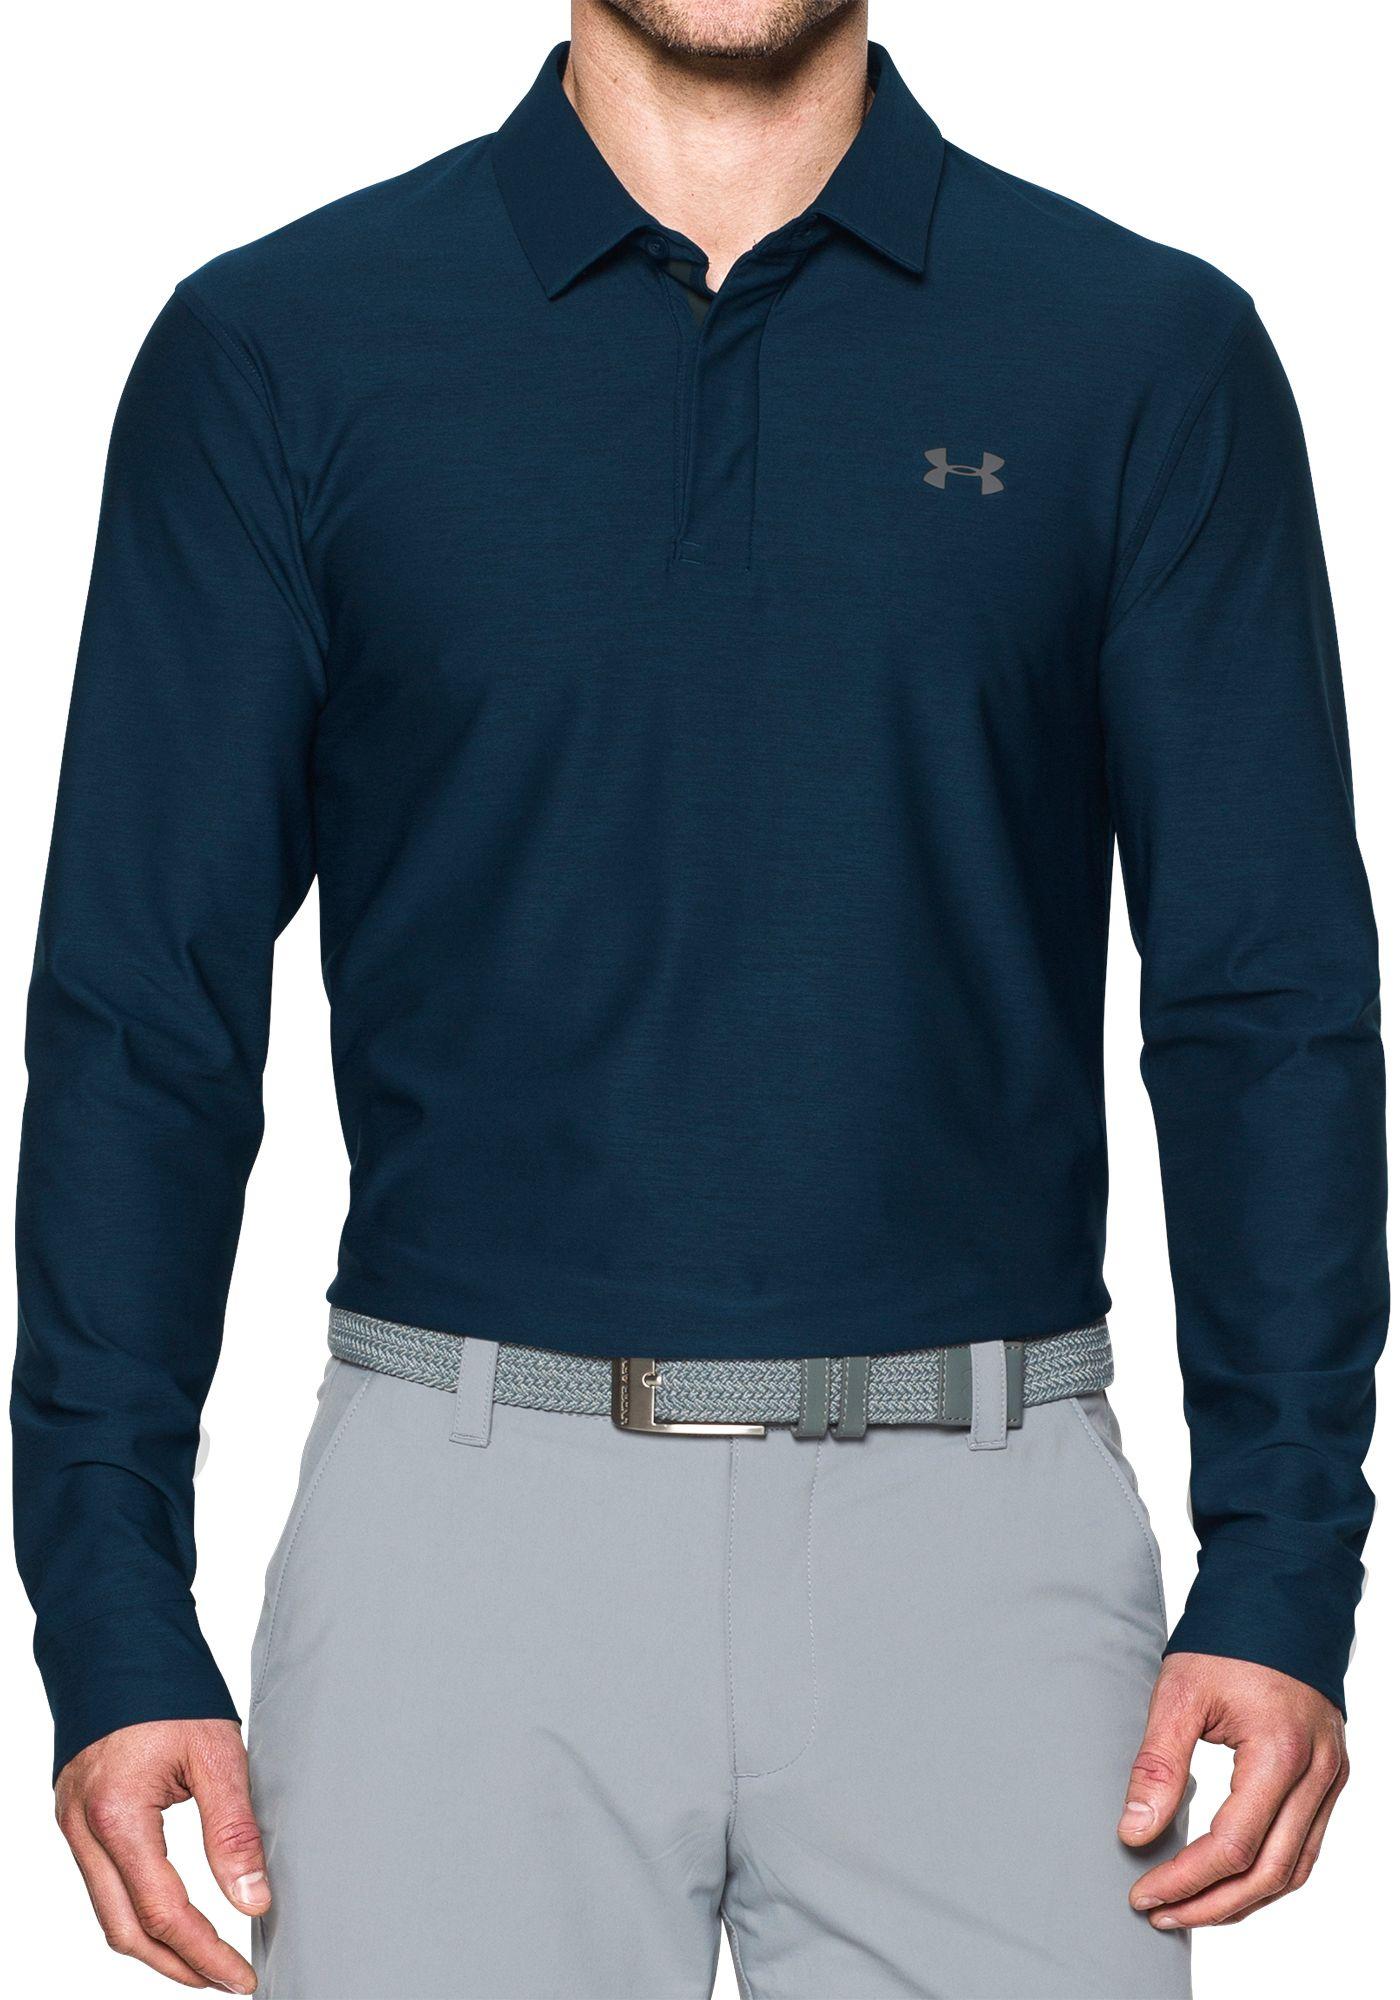 Under Armour Men's Long Sleeve Golf Polo